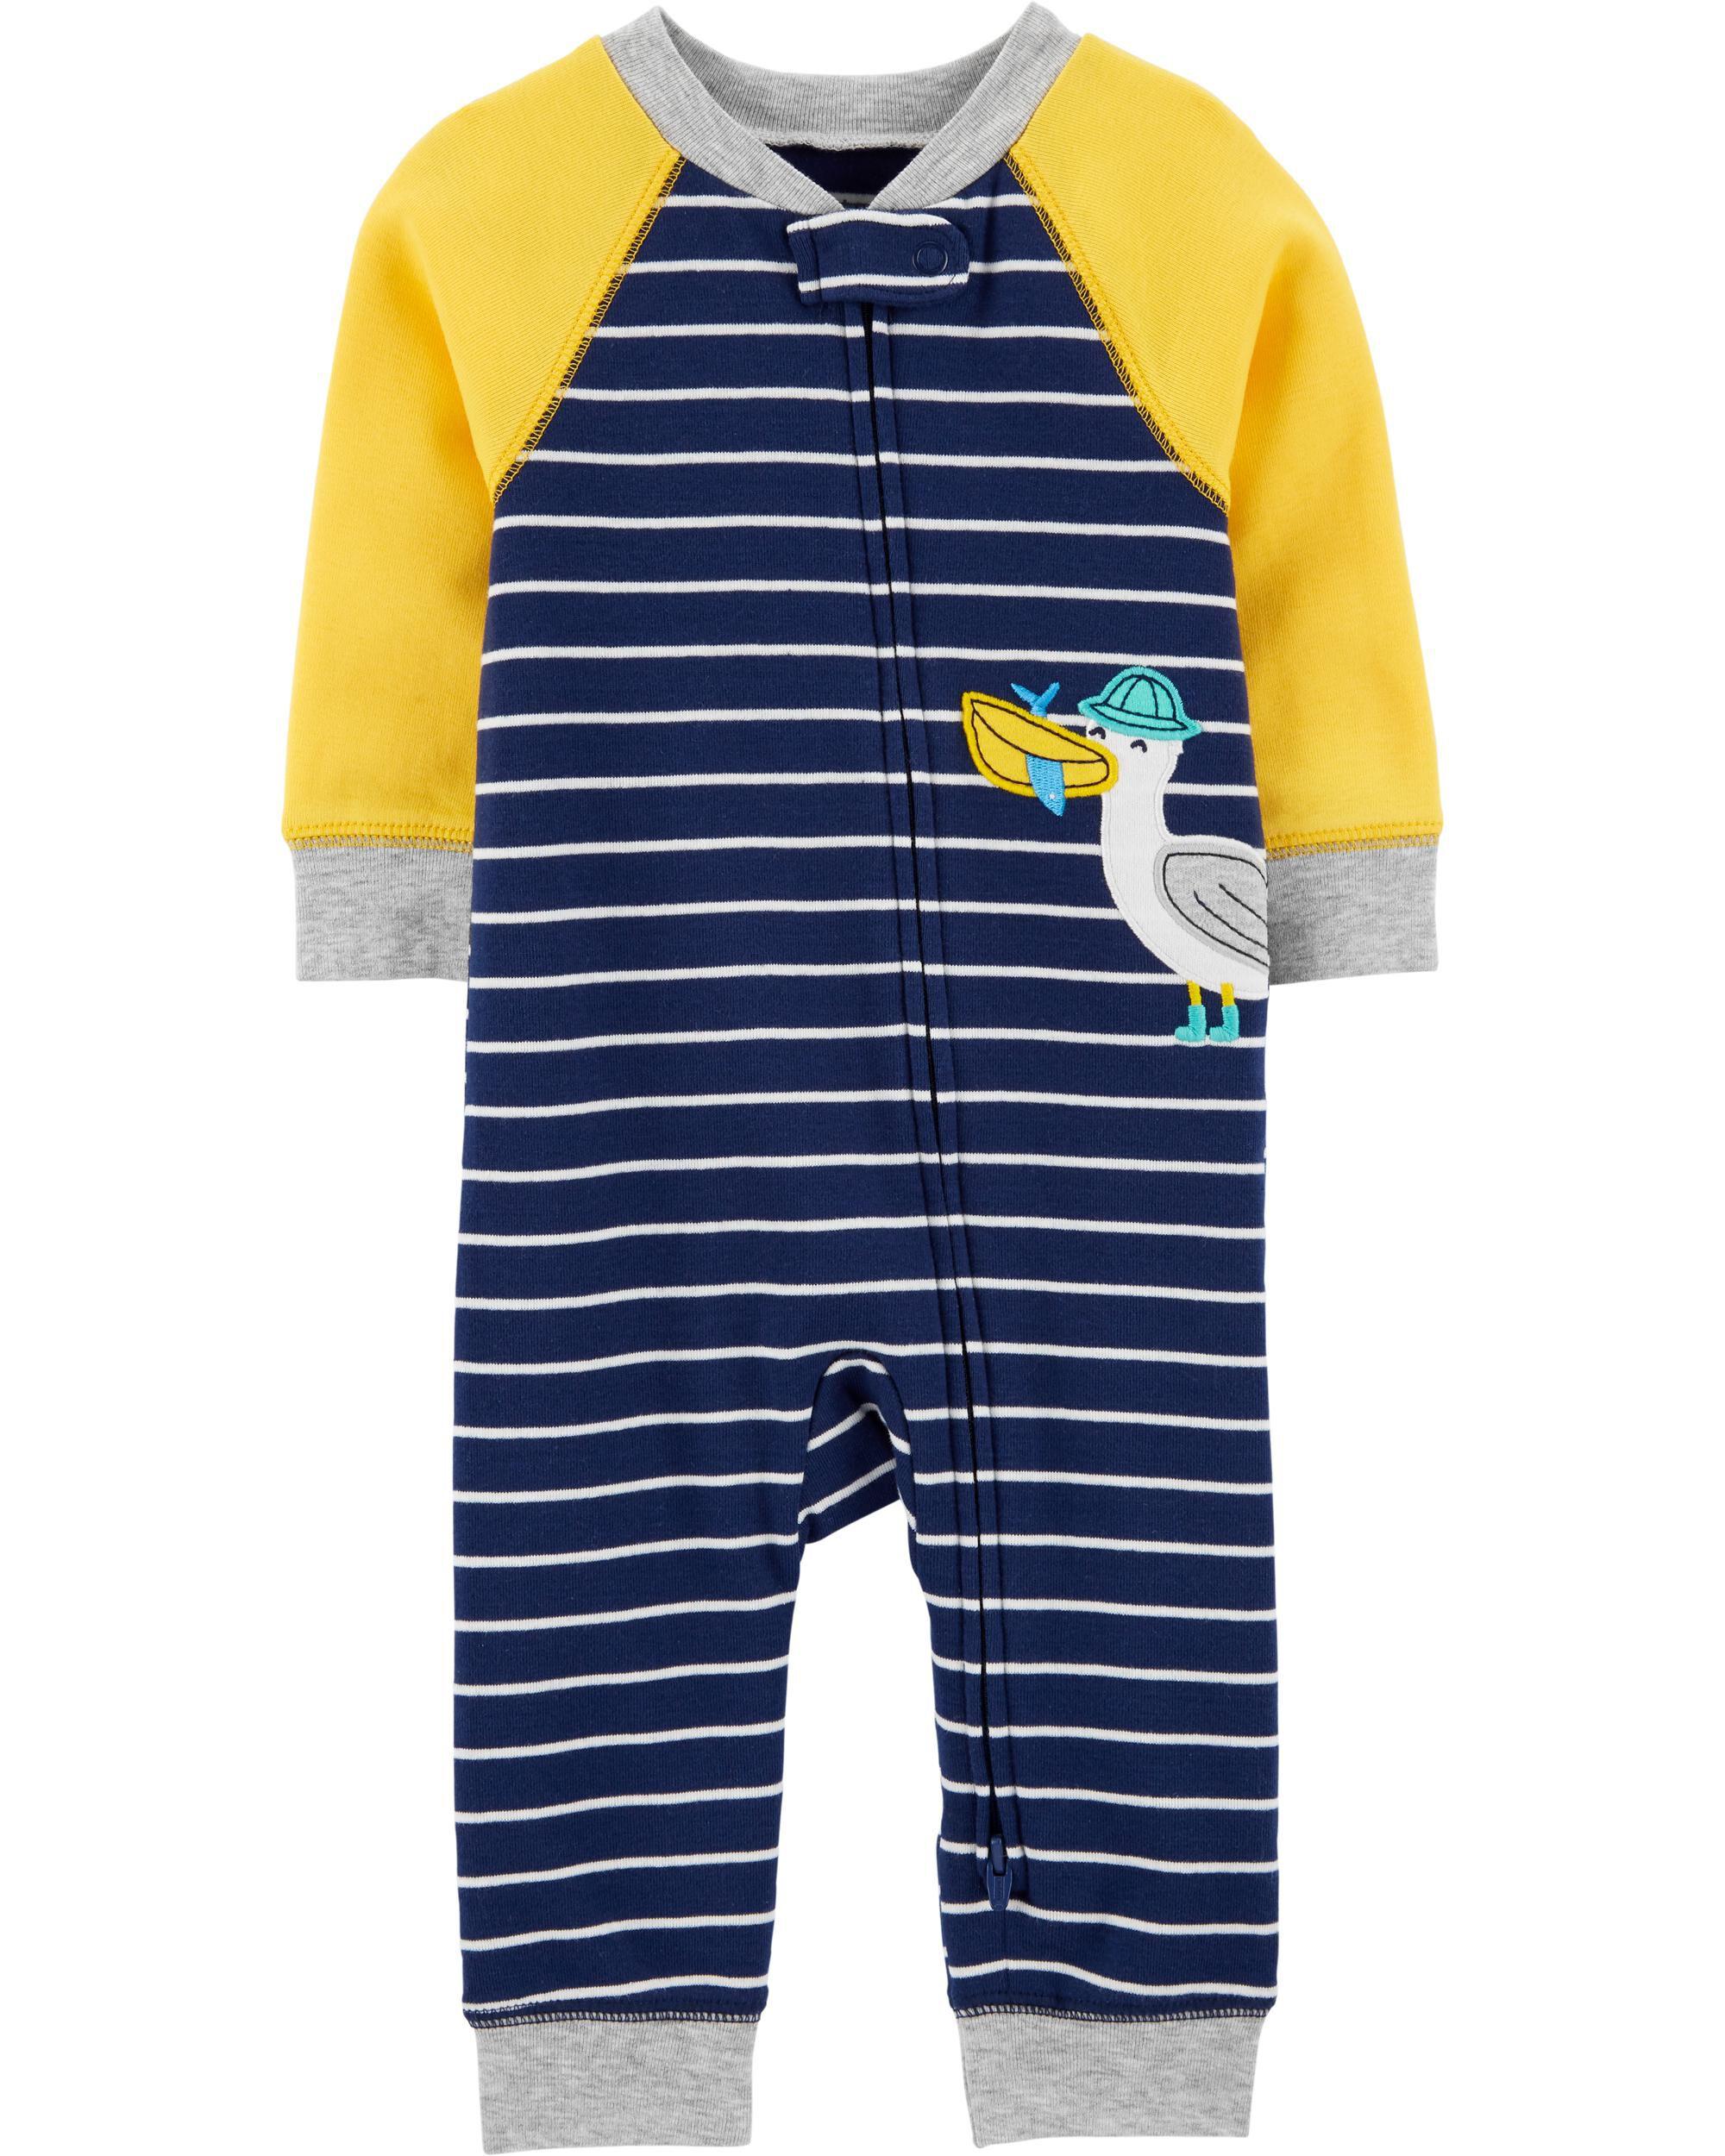 *CLEARANCE* Seagull 2-Way Zip Cotton Sleep & Play